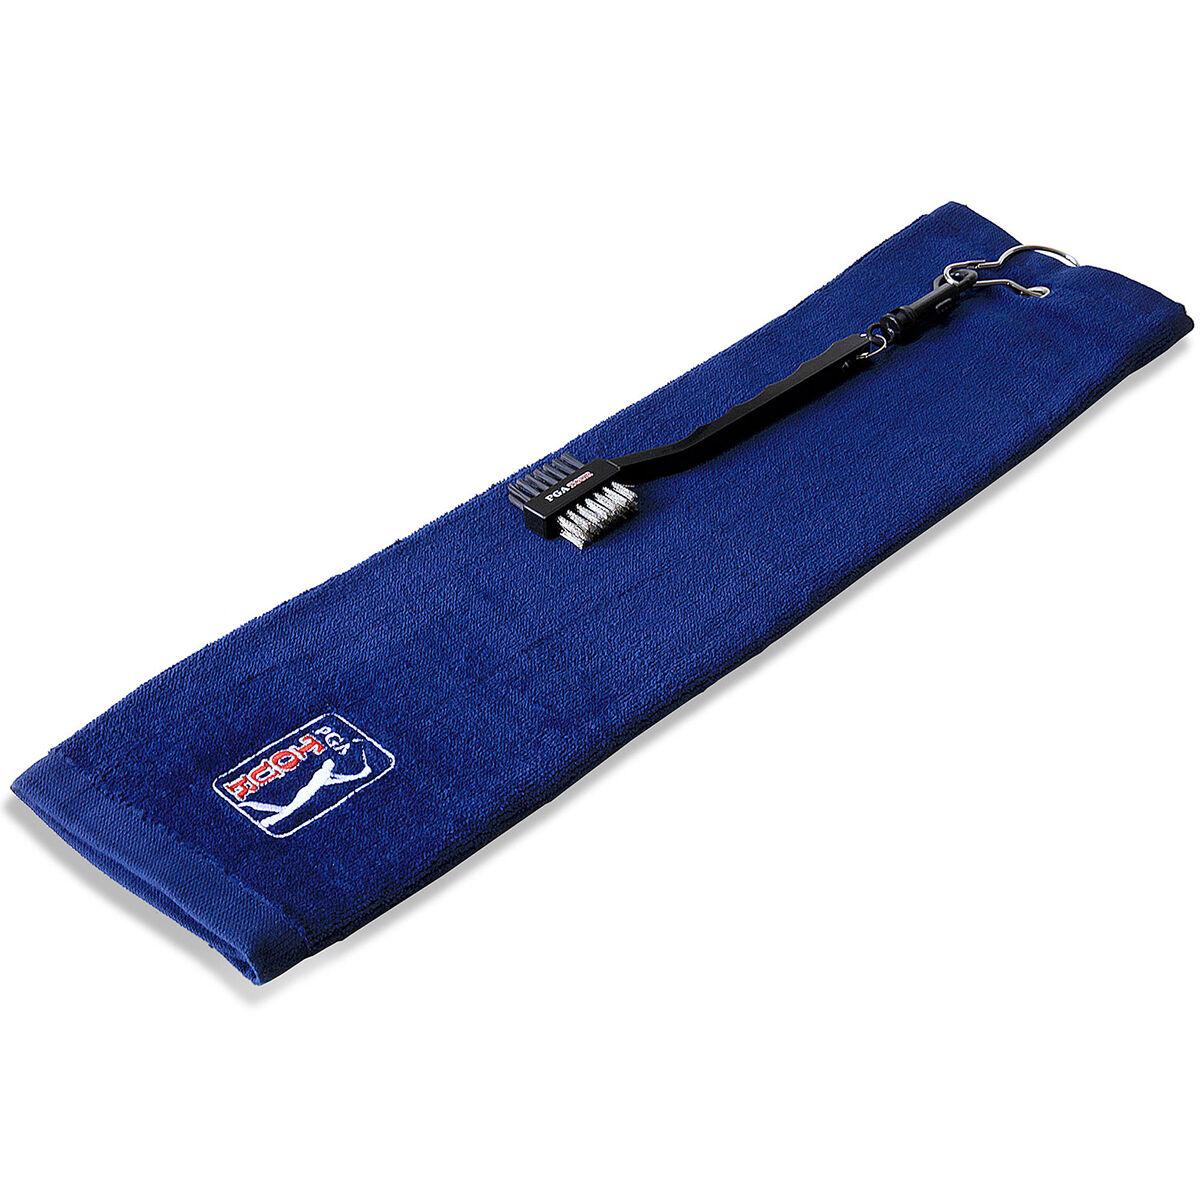 PGA Tour Towel and Brush Set, Male, TOWEL & BRUSH, Blue, Large | American Golf